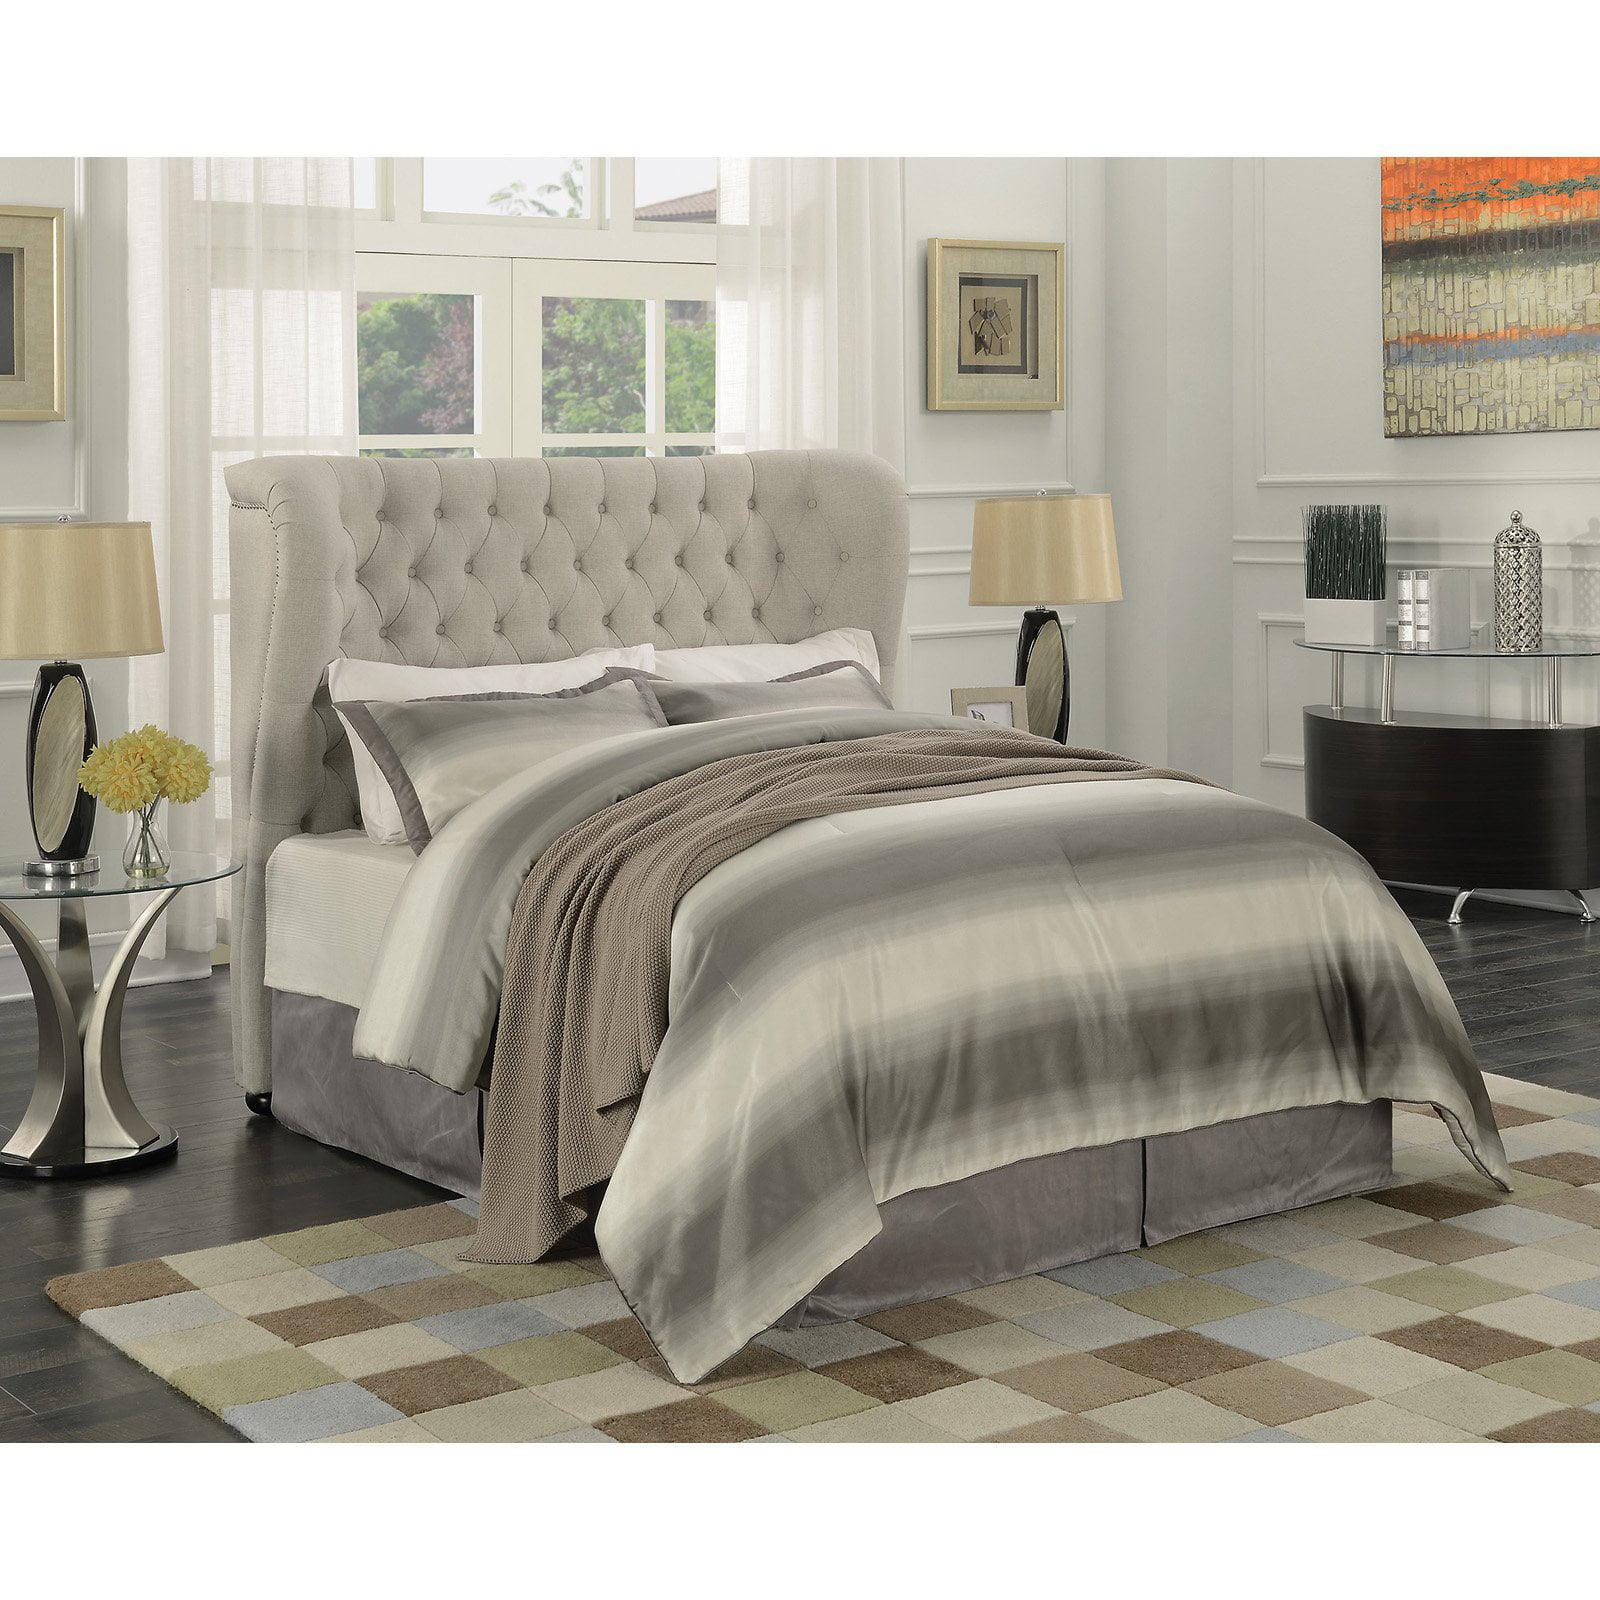 Coaster Furniture Newburgh Panel Bed